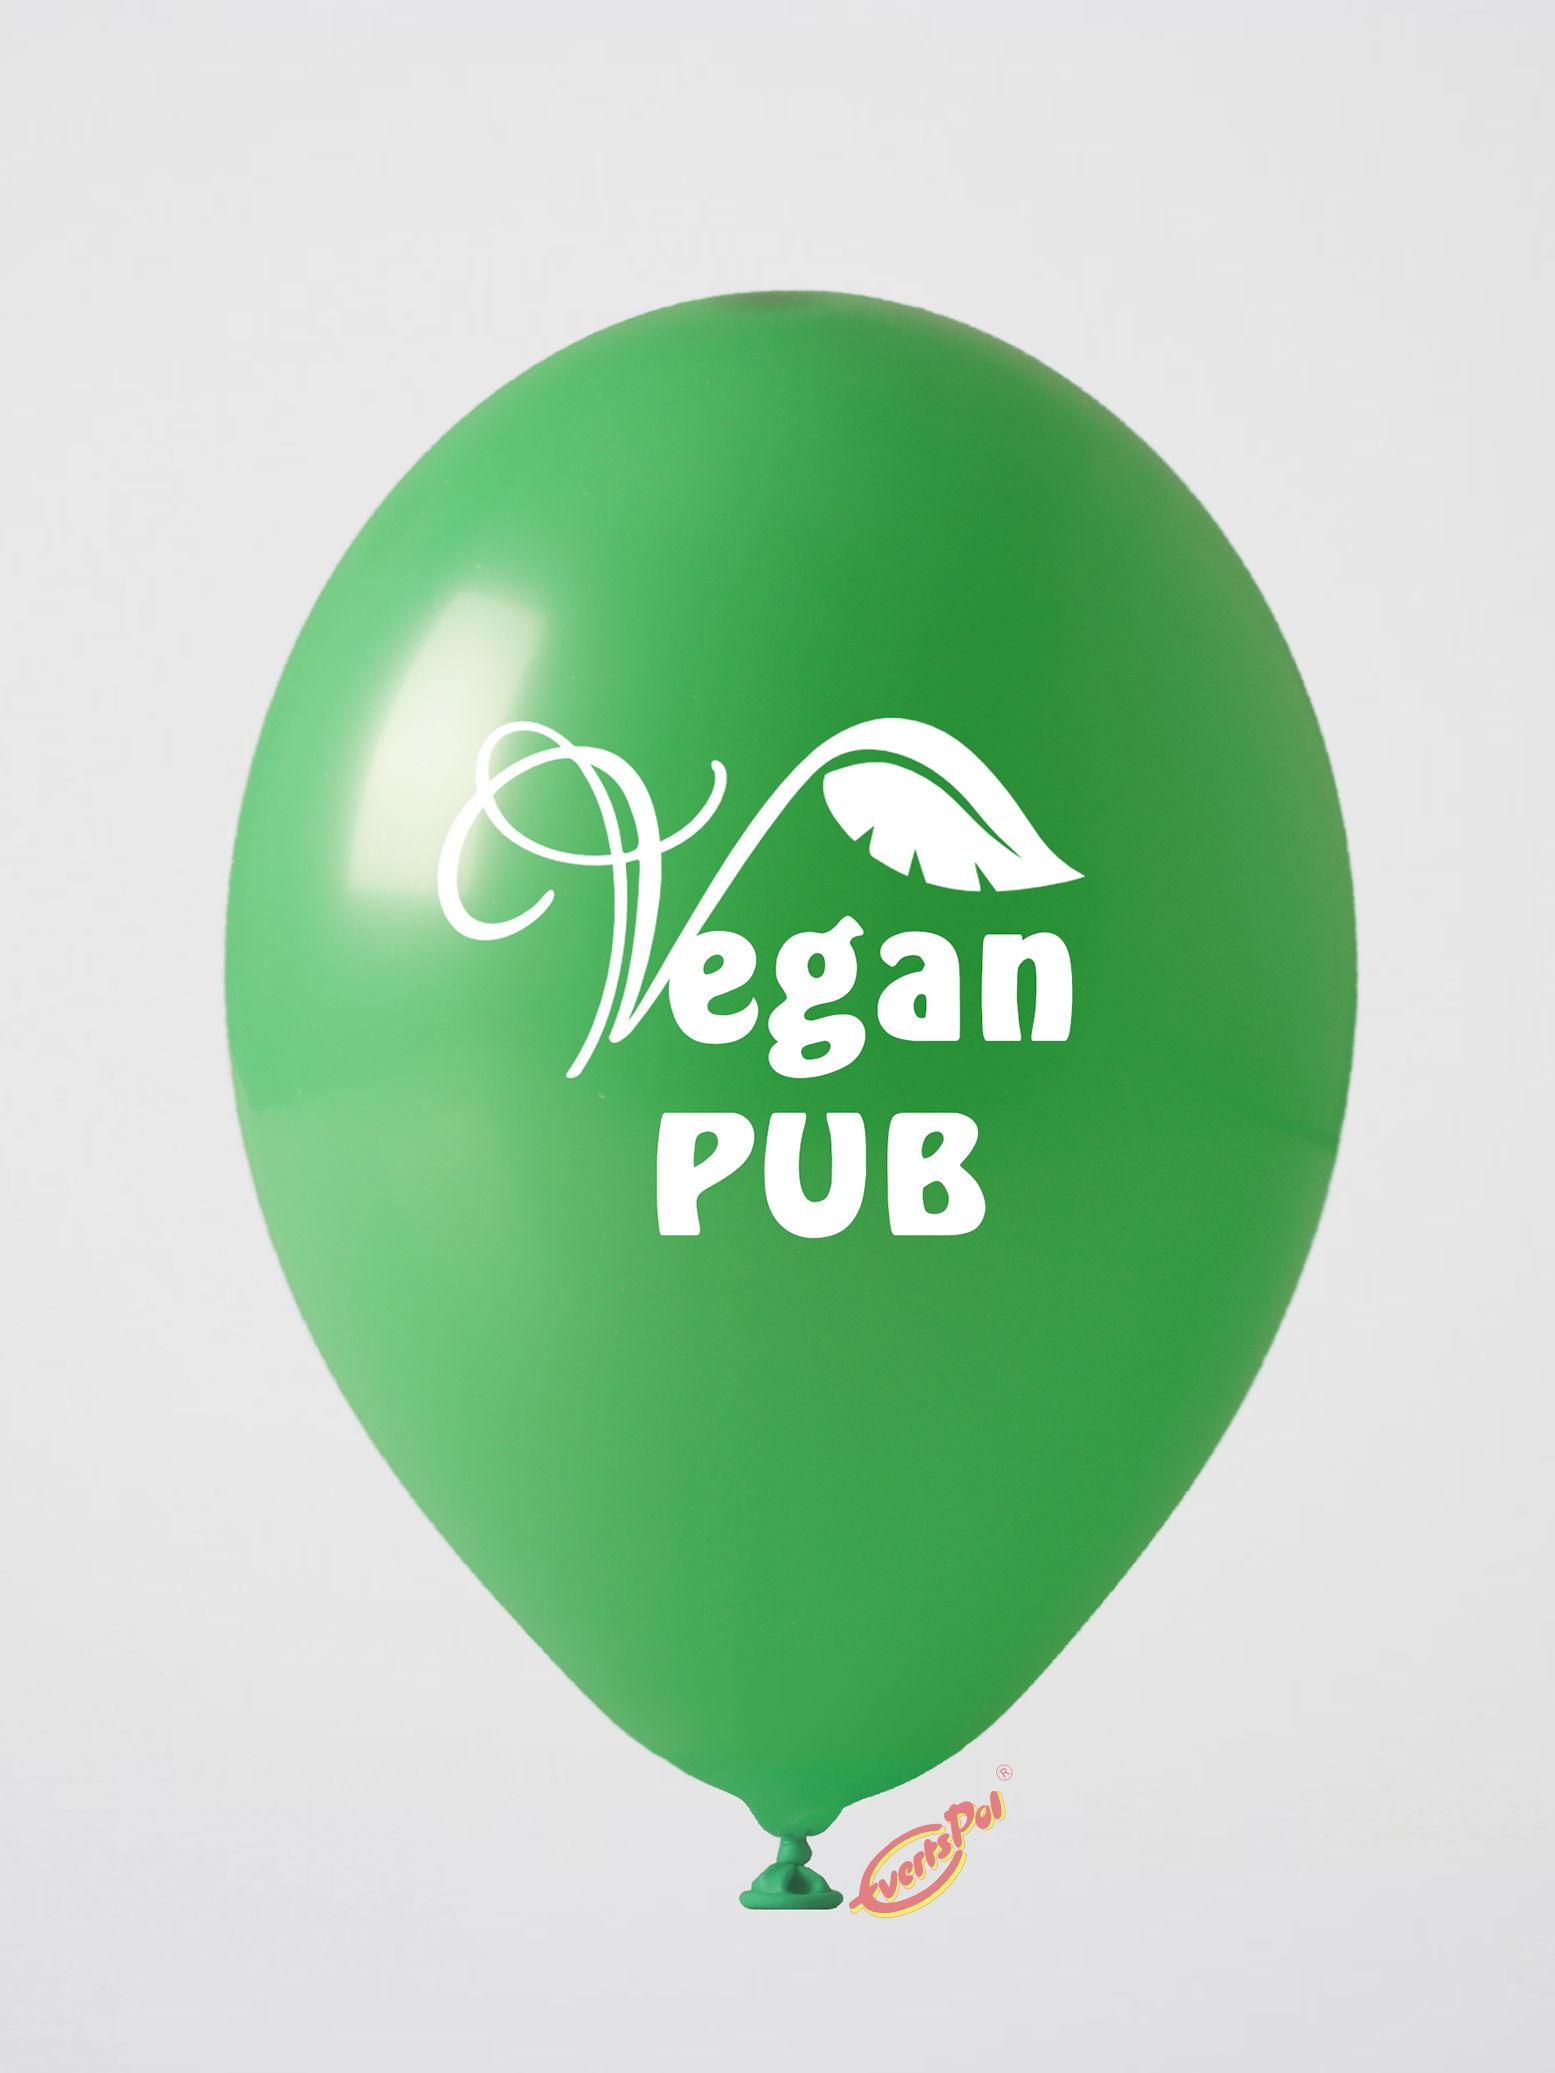 160 vegan